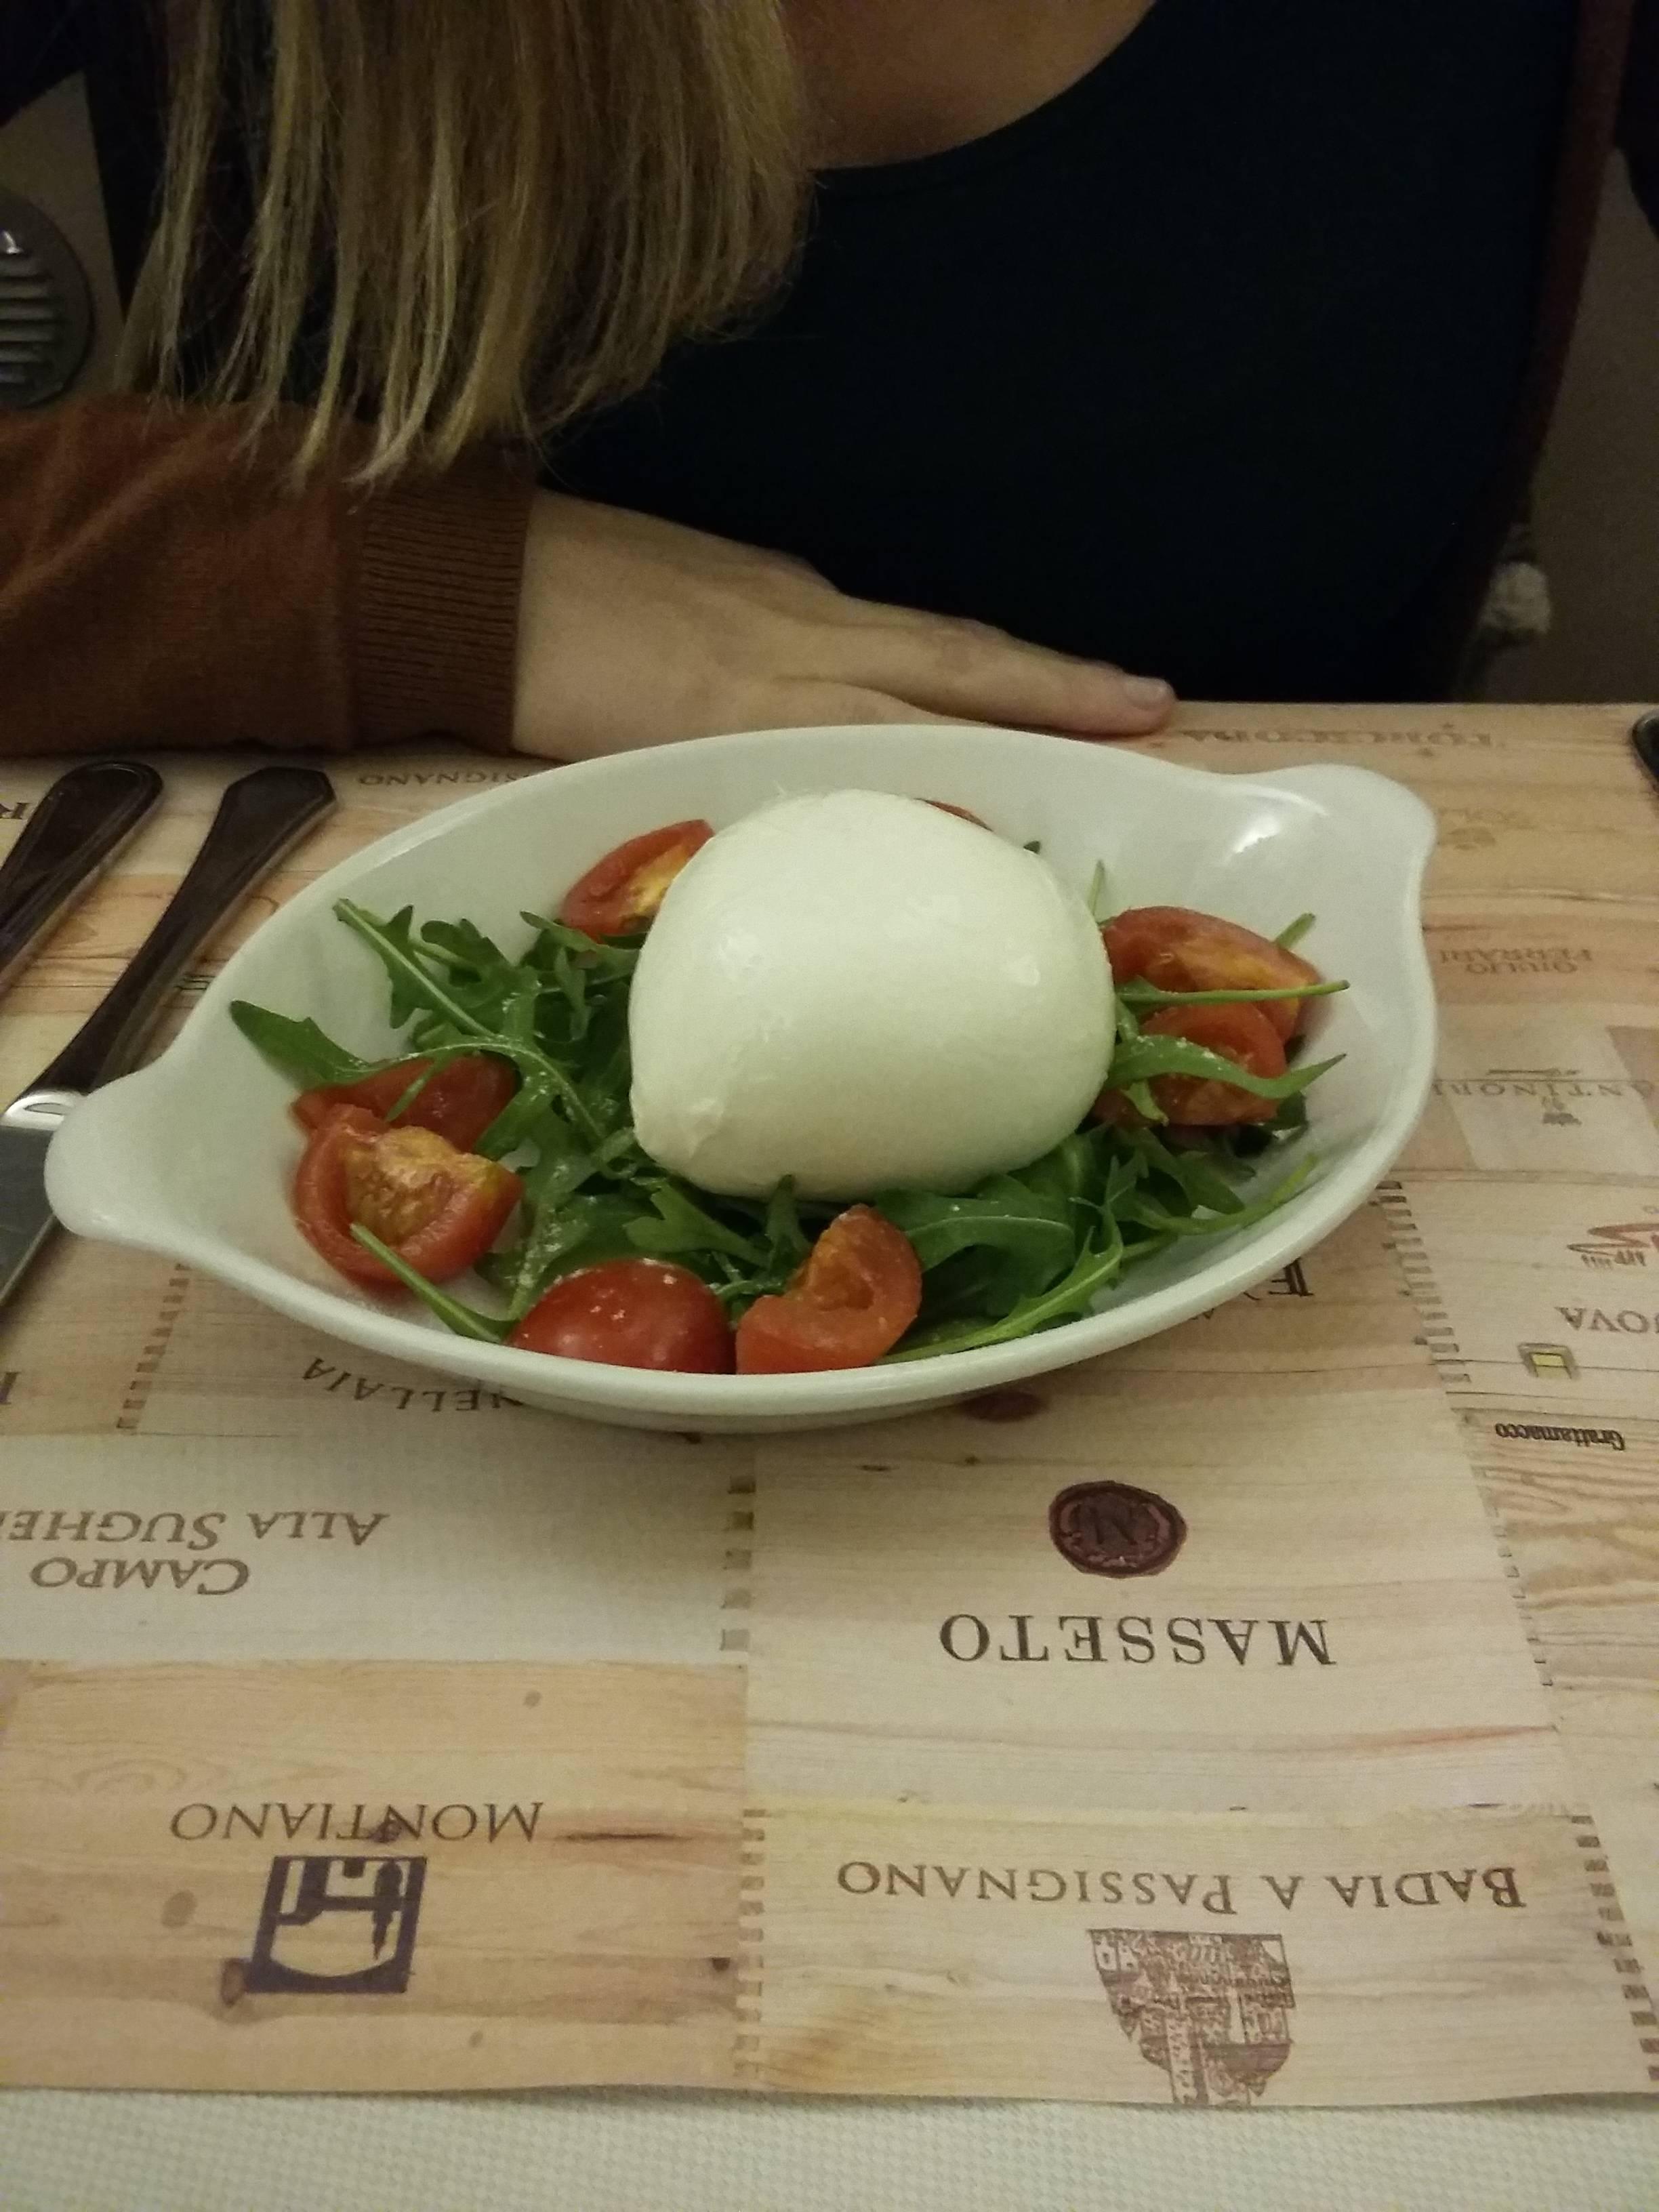 Photo 2: Osteria Barberini, la truffe sous toutes ses formes!